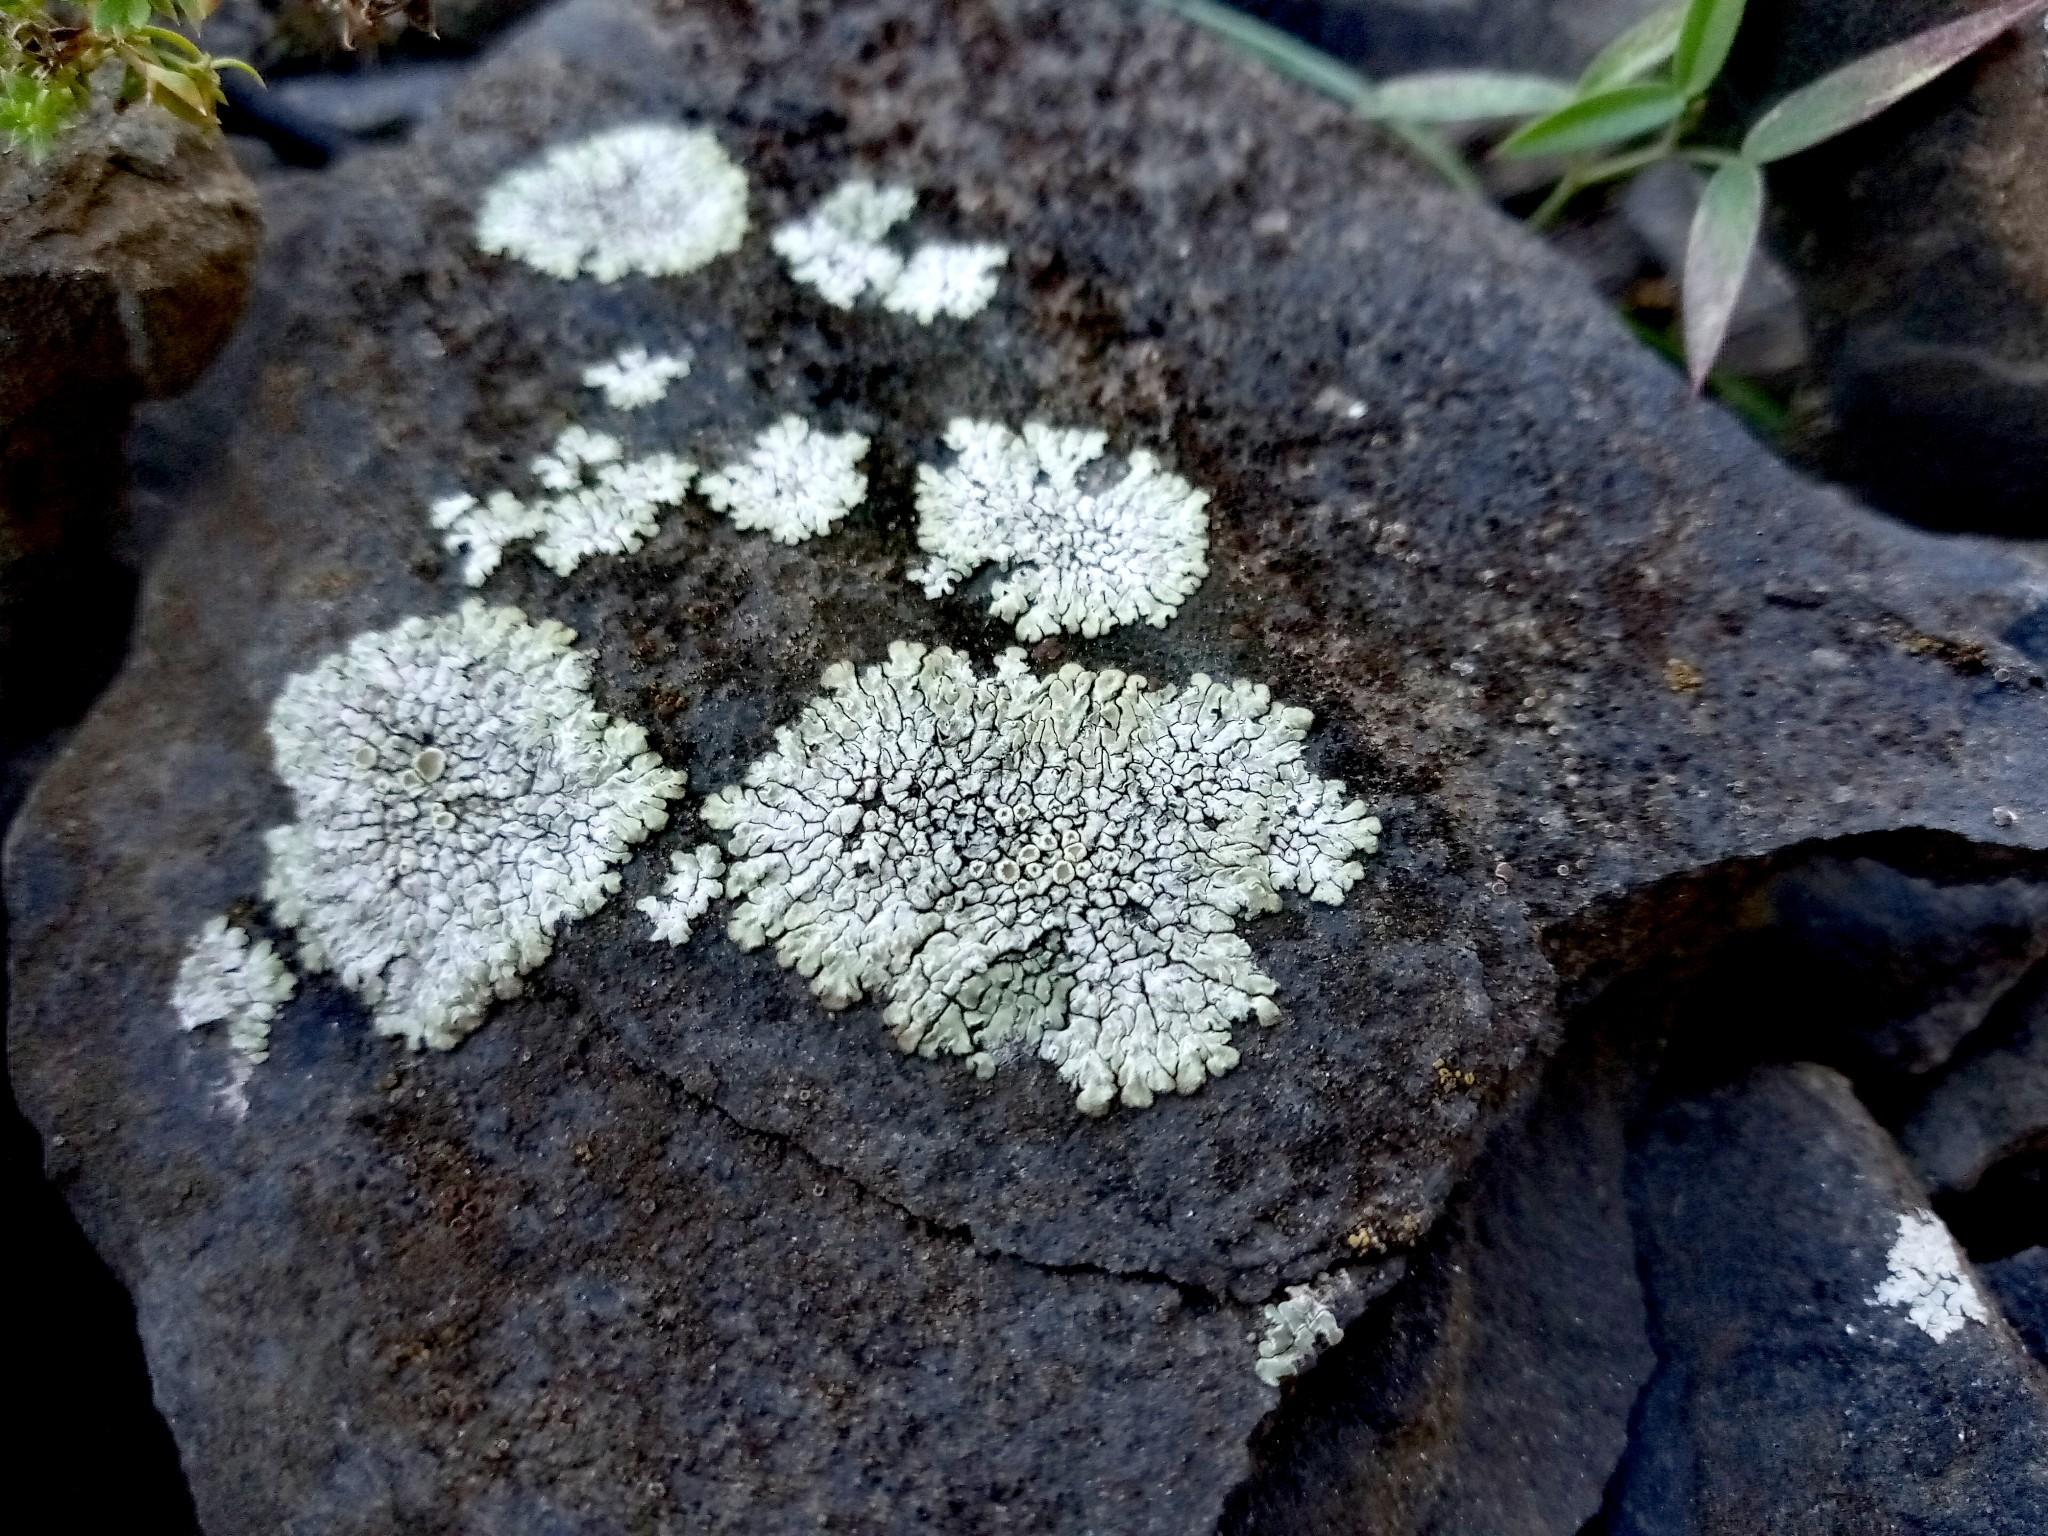 lichens on stones photo 9